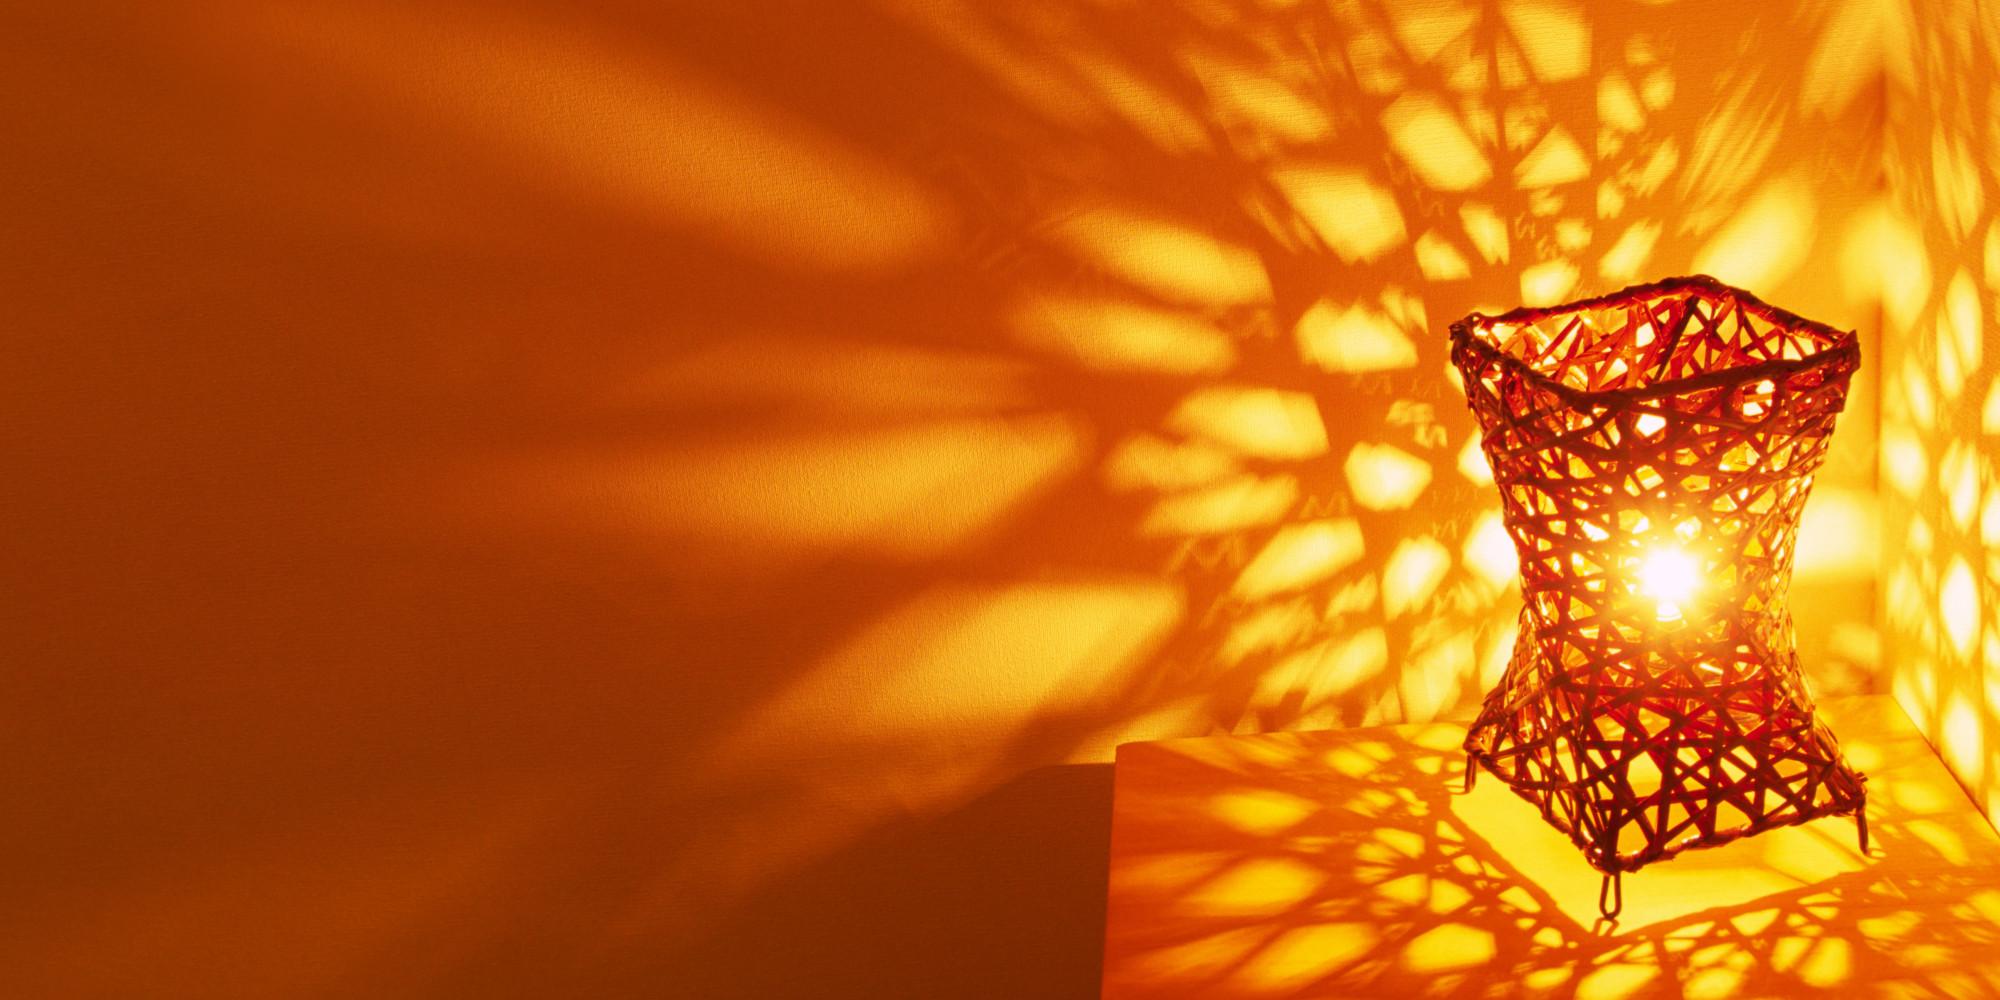 lighting in room. Lighting In Room